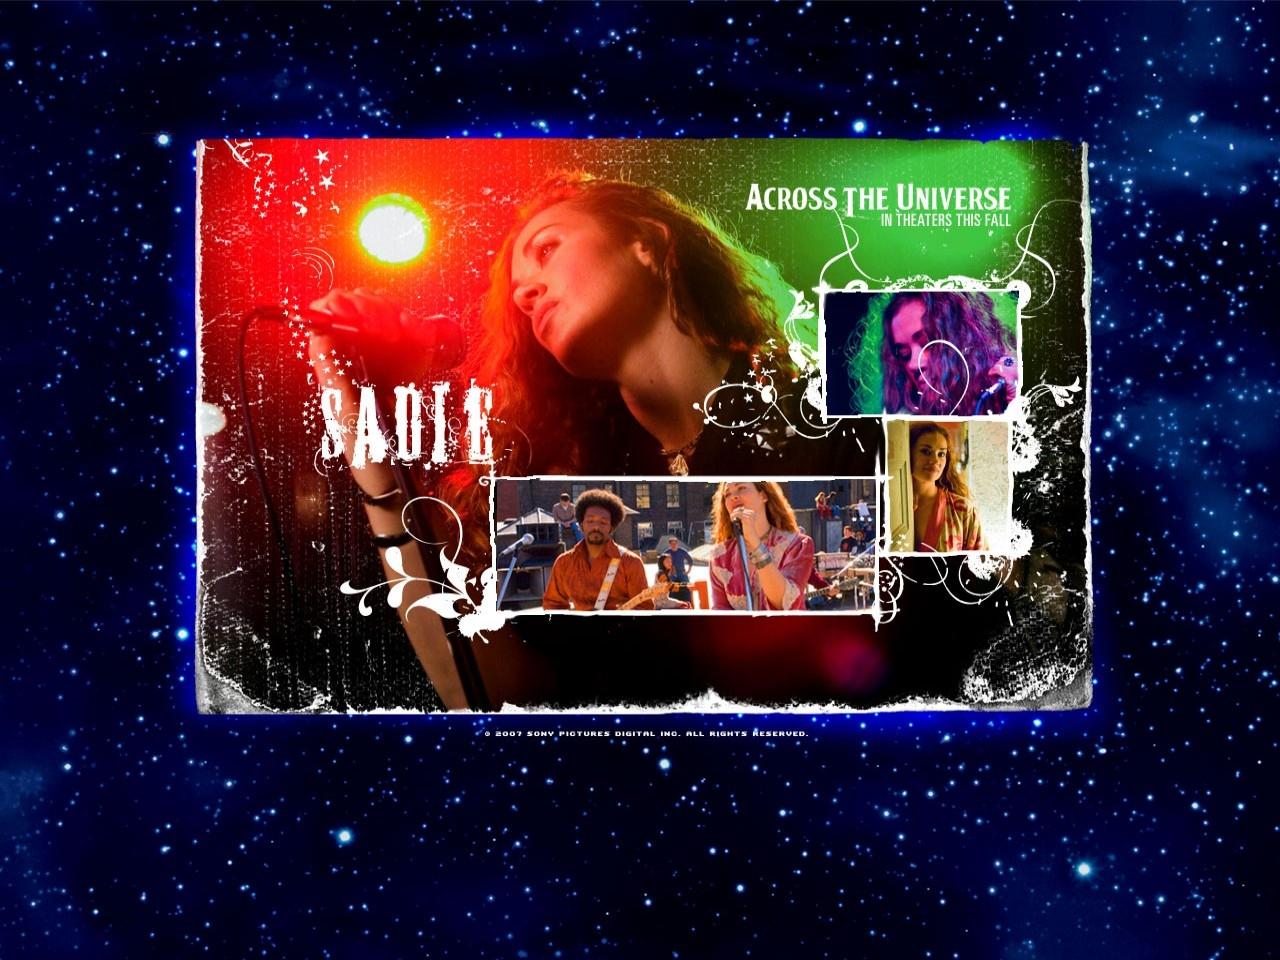 Wallpaper del film musicale Across the Universe